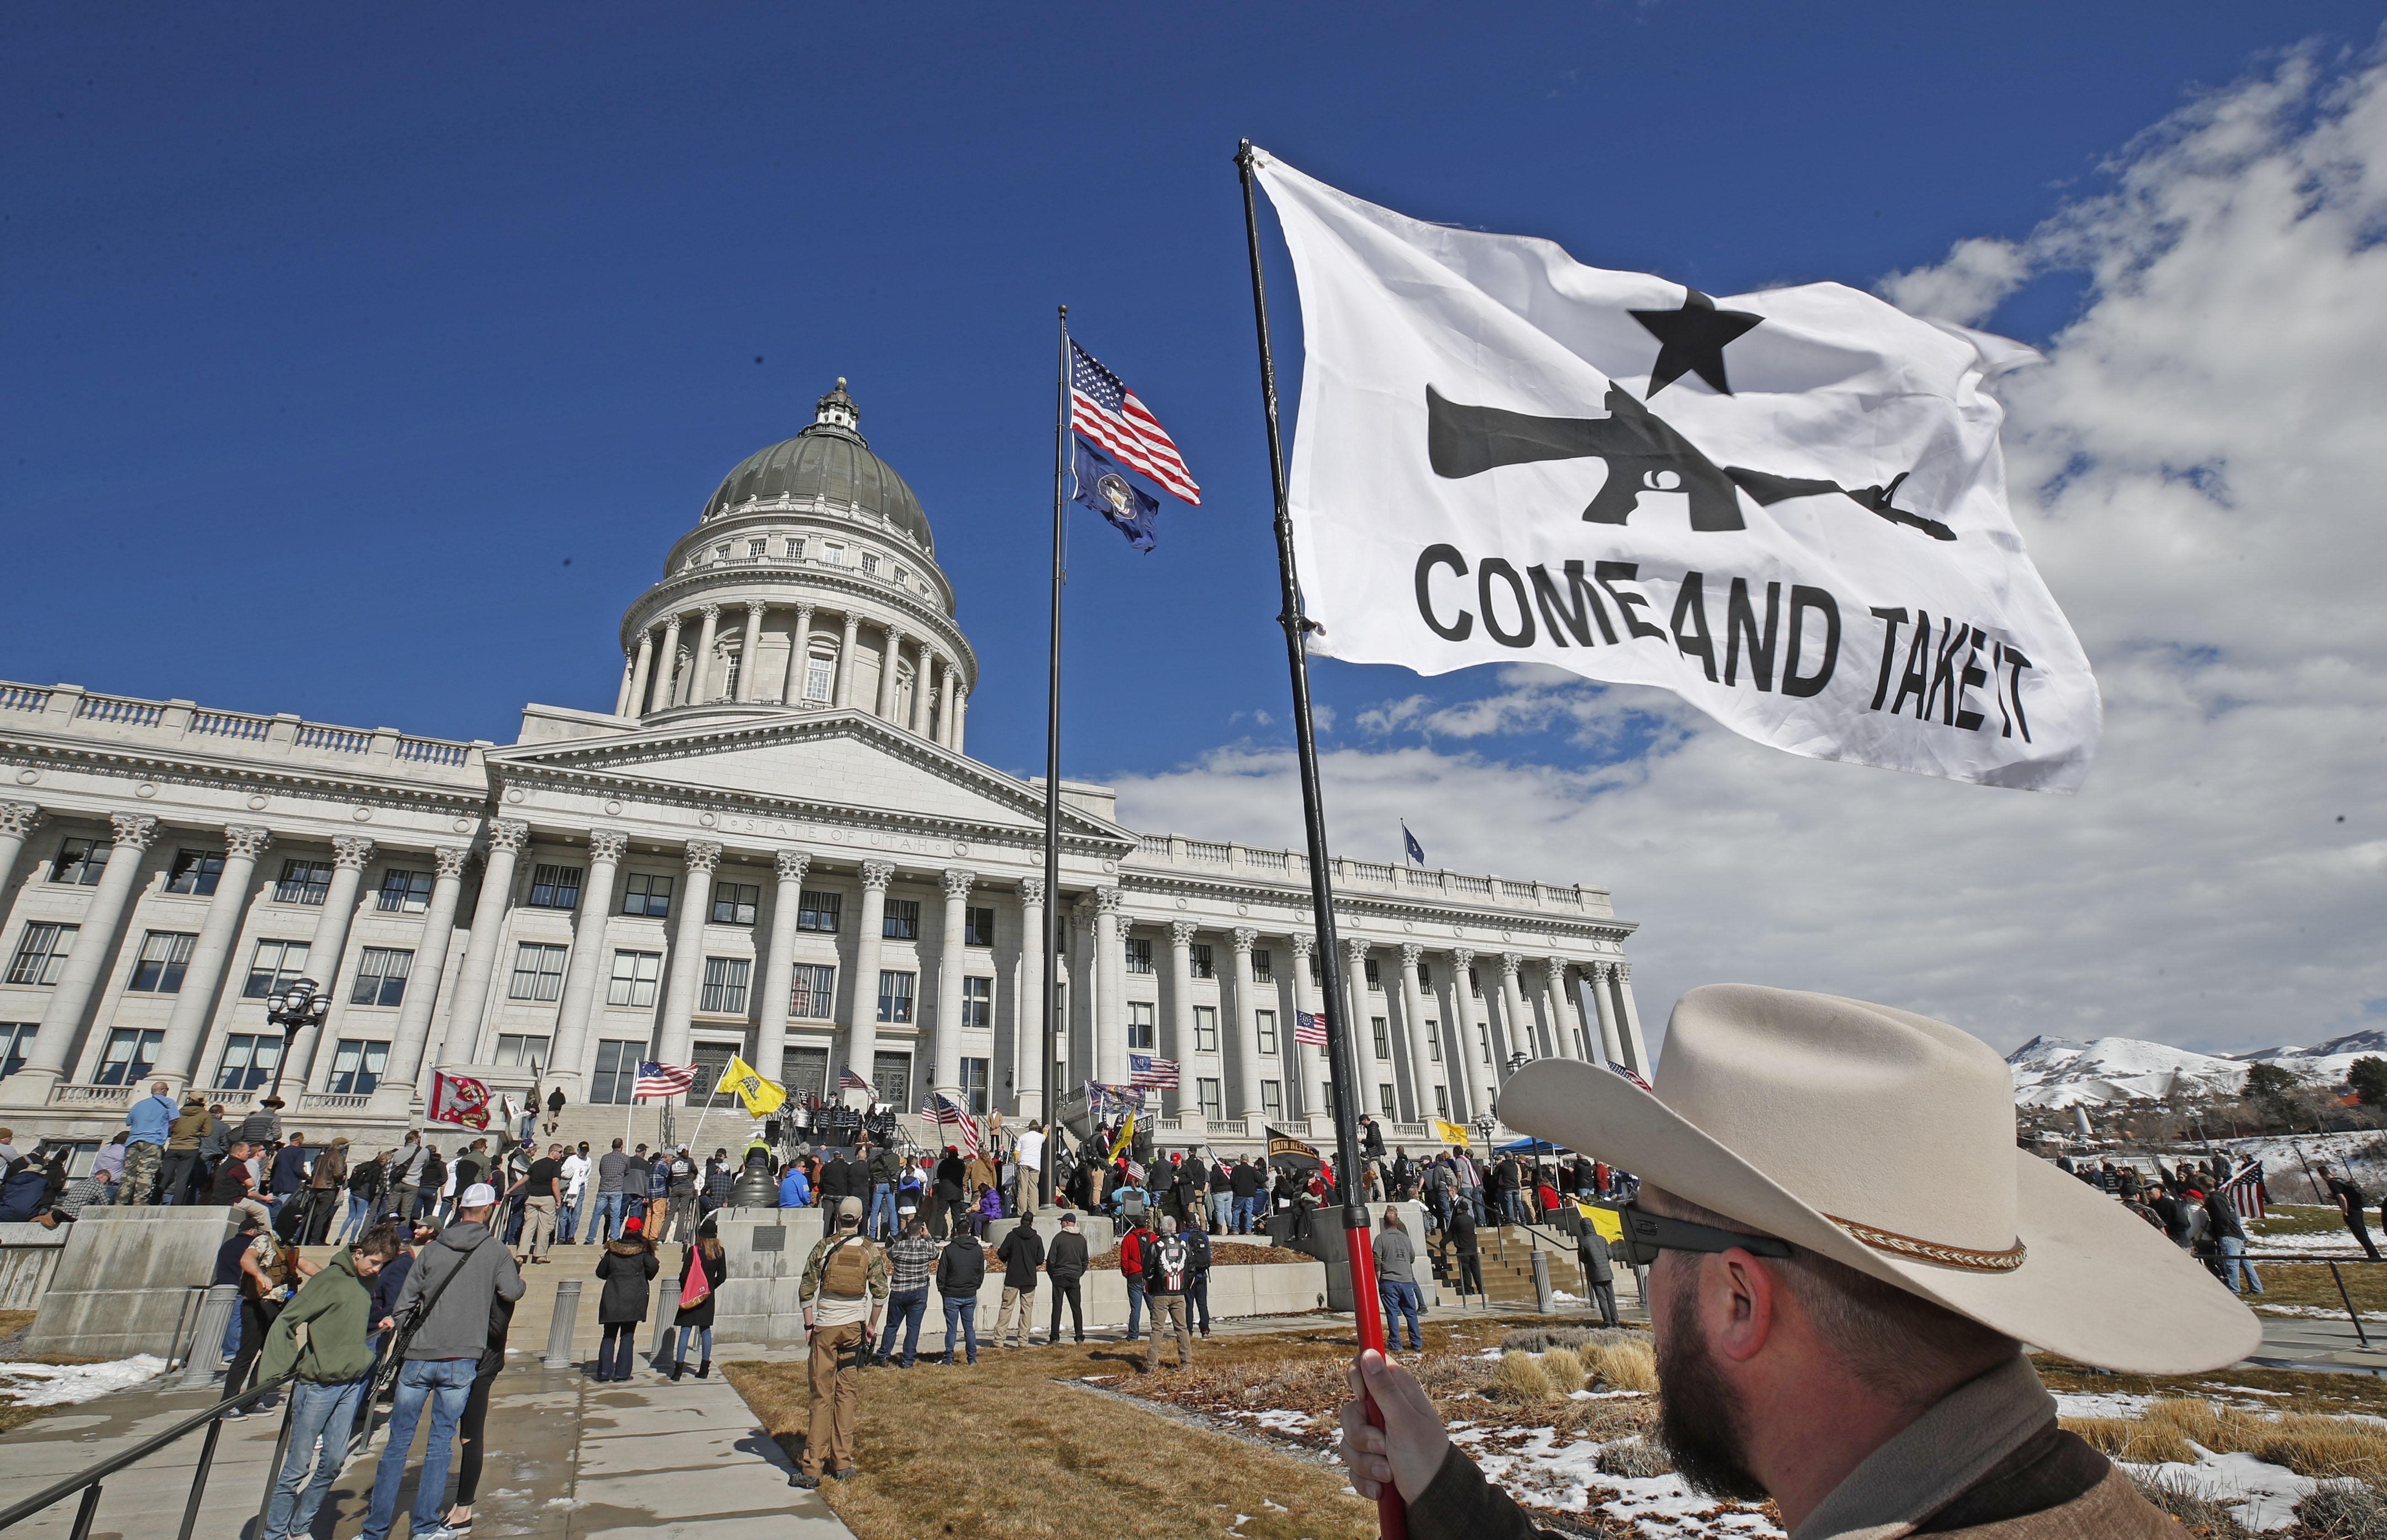 Virginia House Of Delegates Passes Gun Ban, Seizure Bill | The Daily Caller